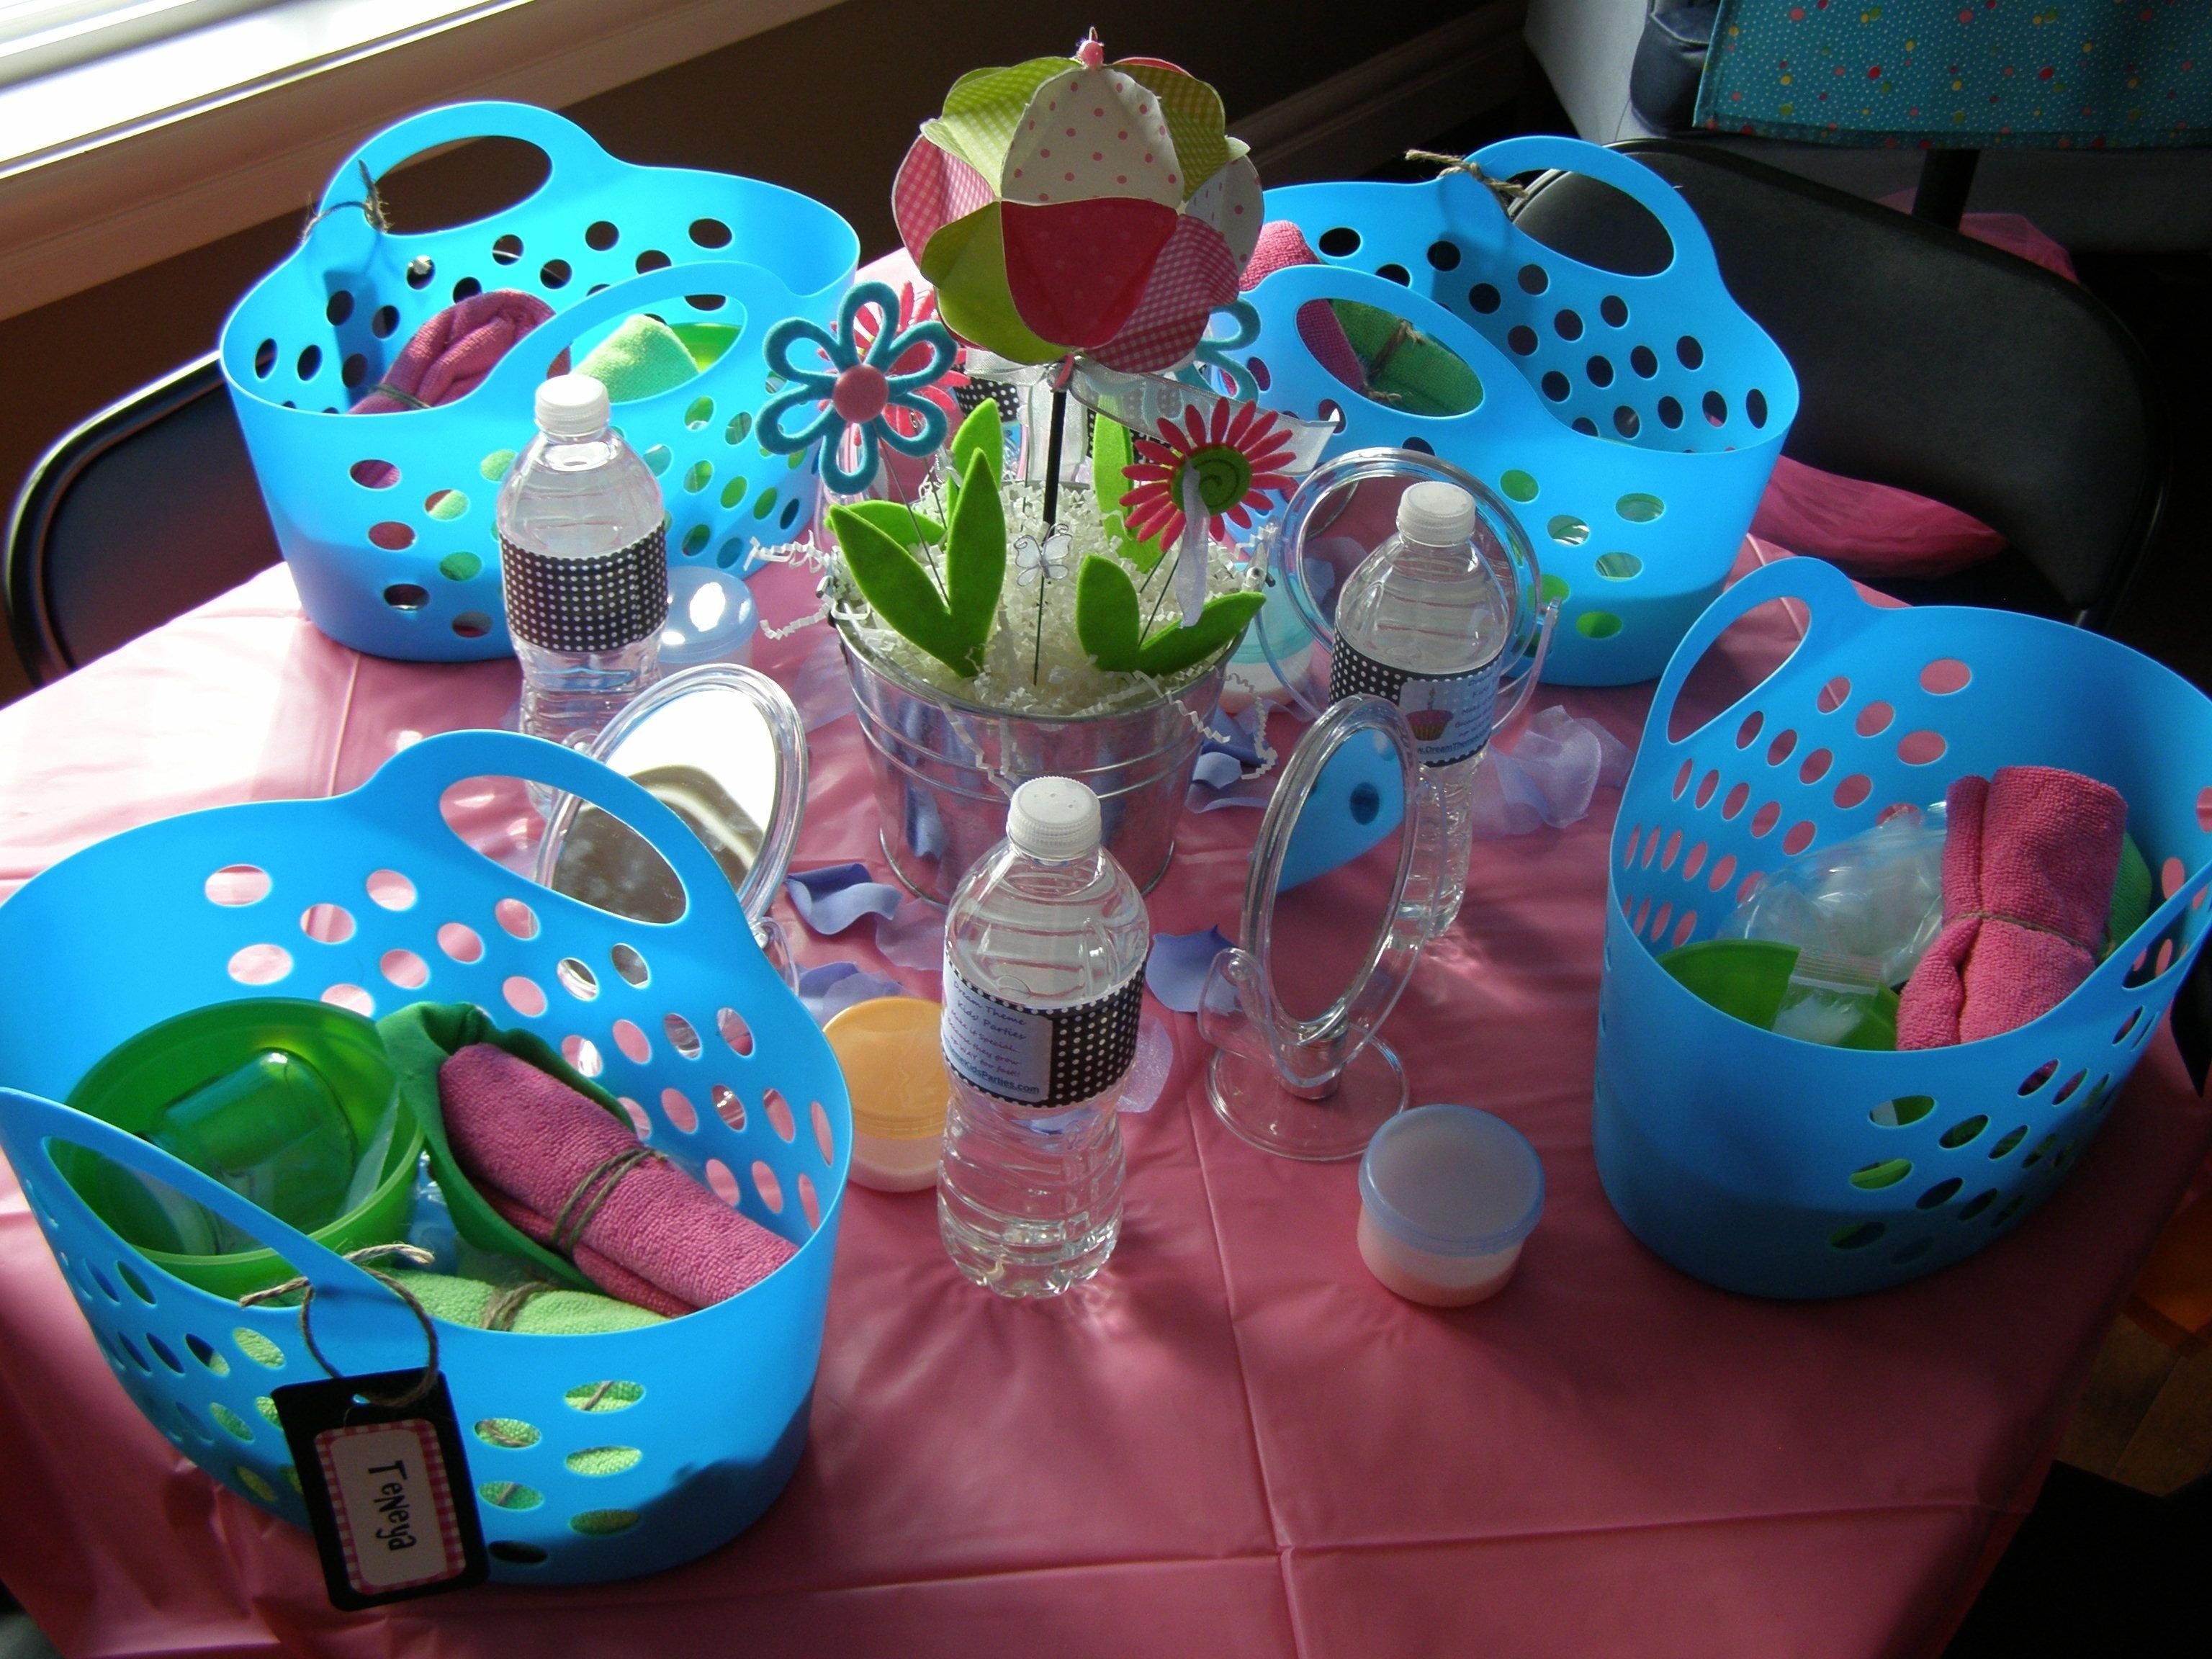 10 Awesome 13Th Birthday Ideas For Girls spa tacular experience birthday party ideas spa party girls dream 3 2021